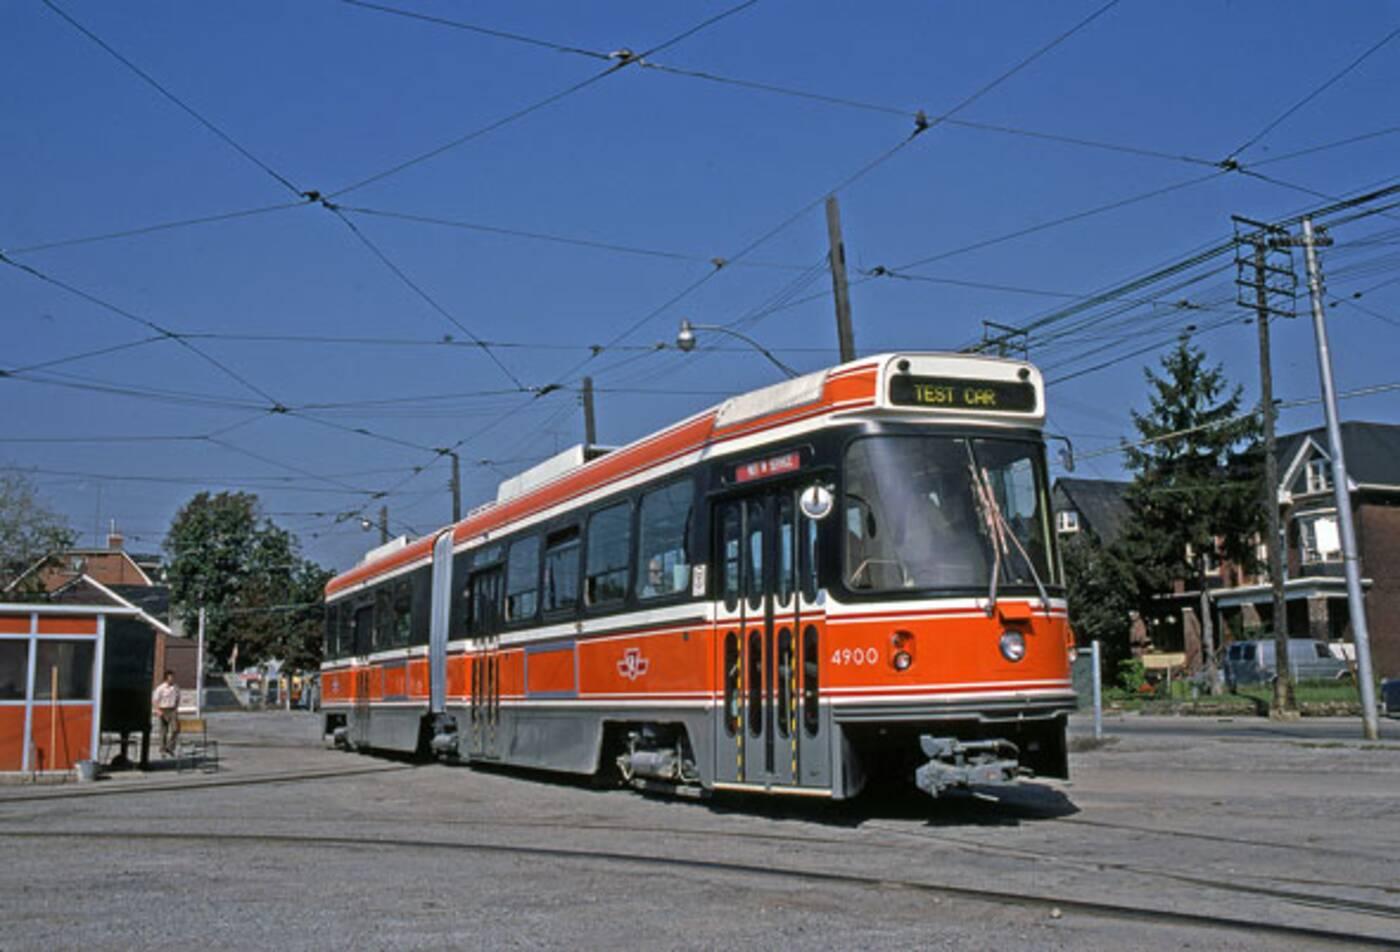 alrv ttc streetcar